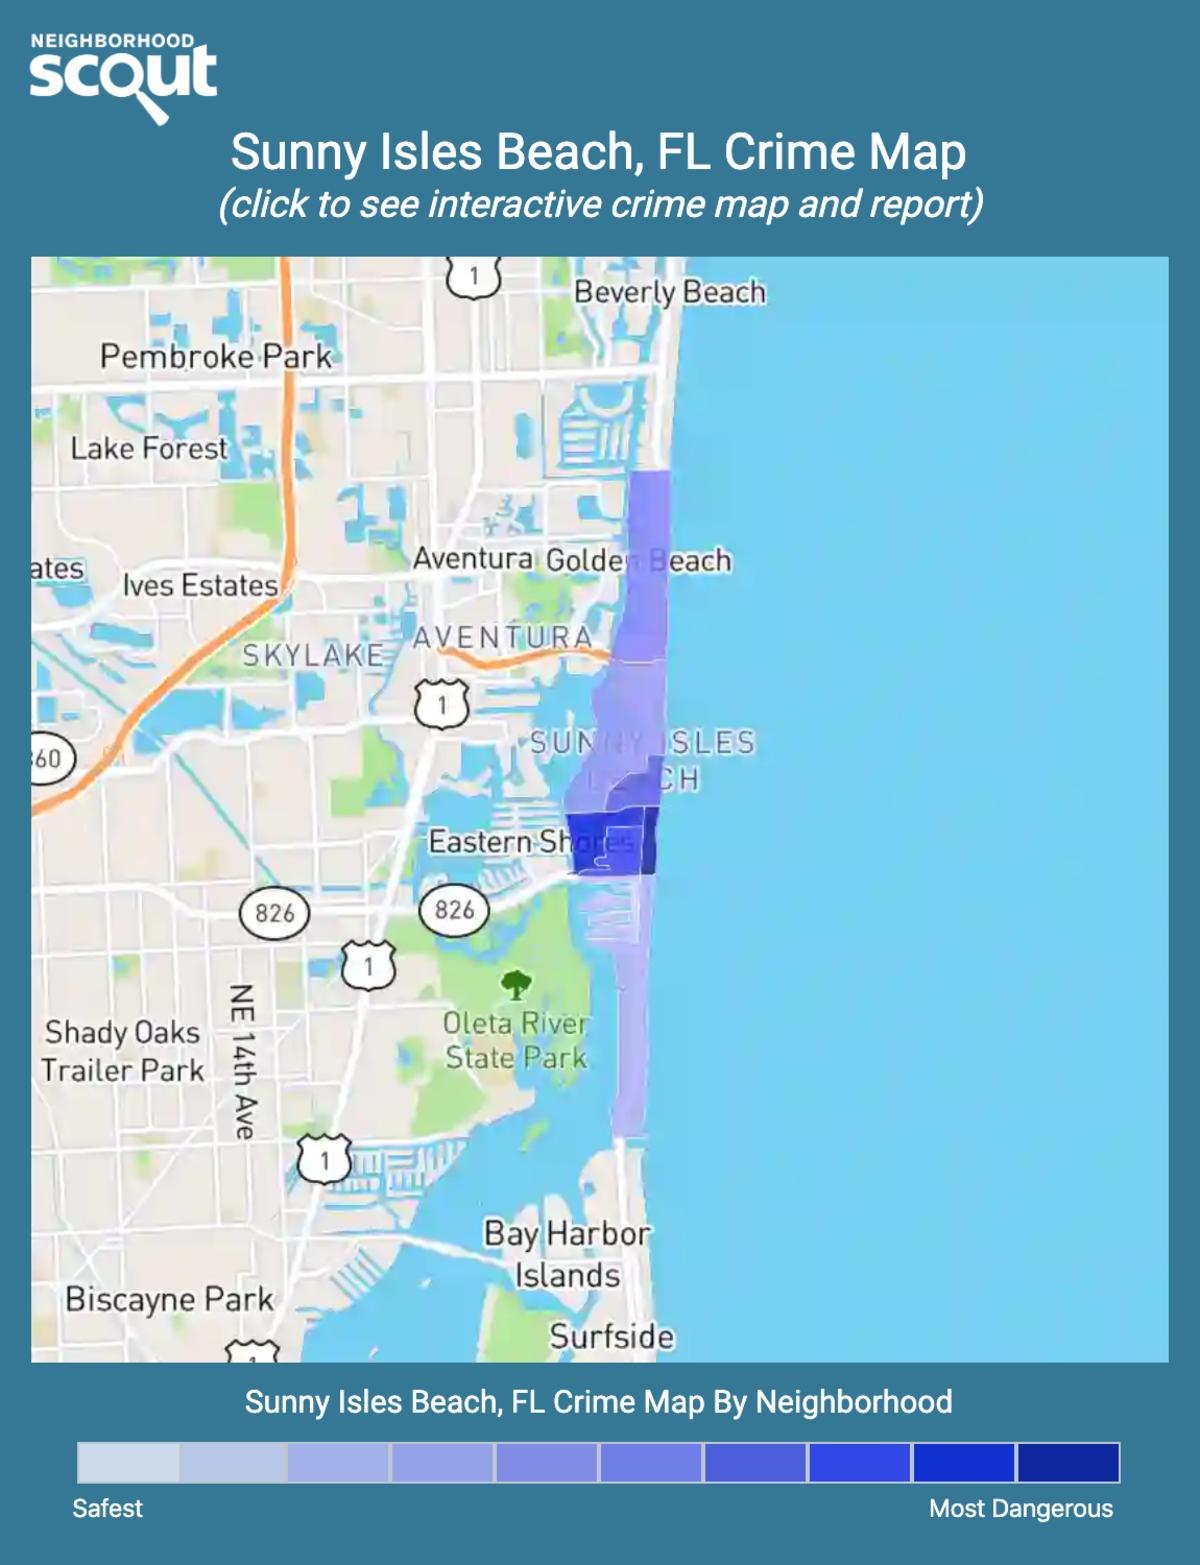 Sunny Isles Beach, Florida crime map